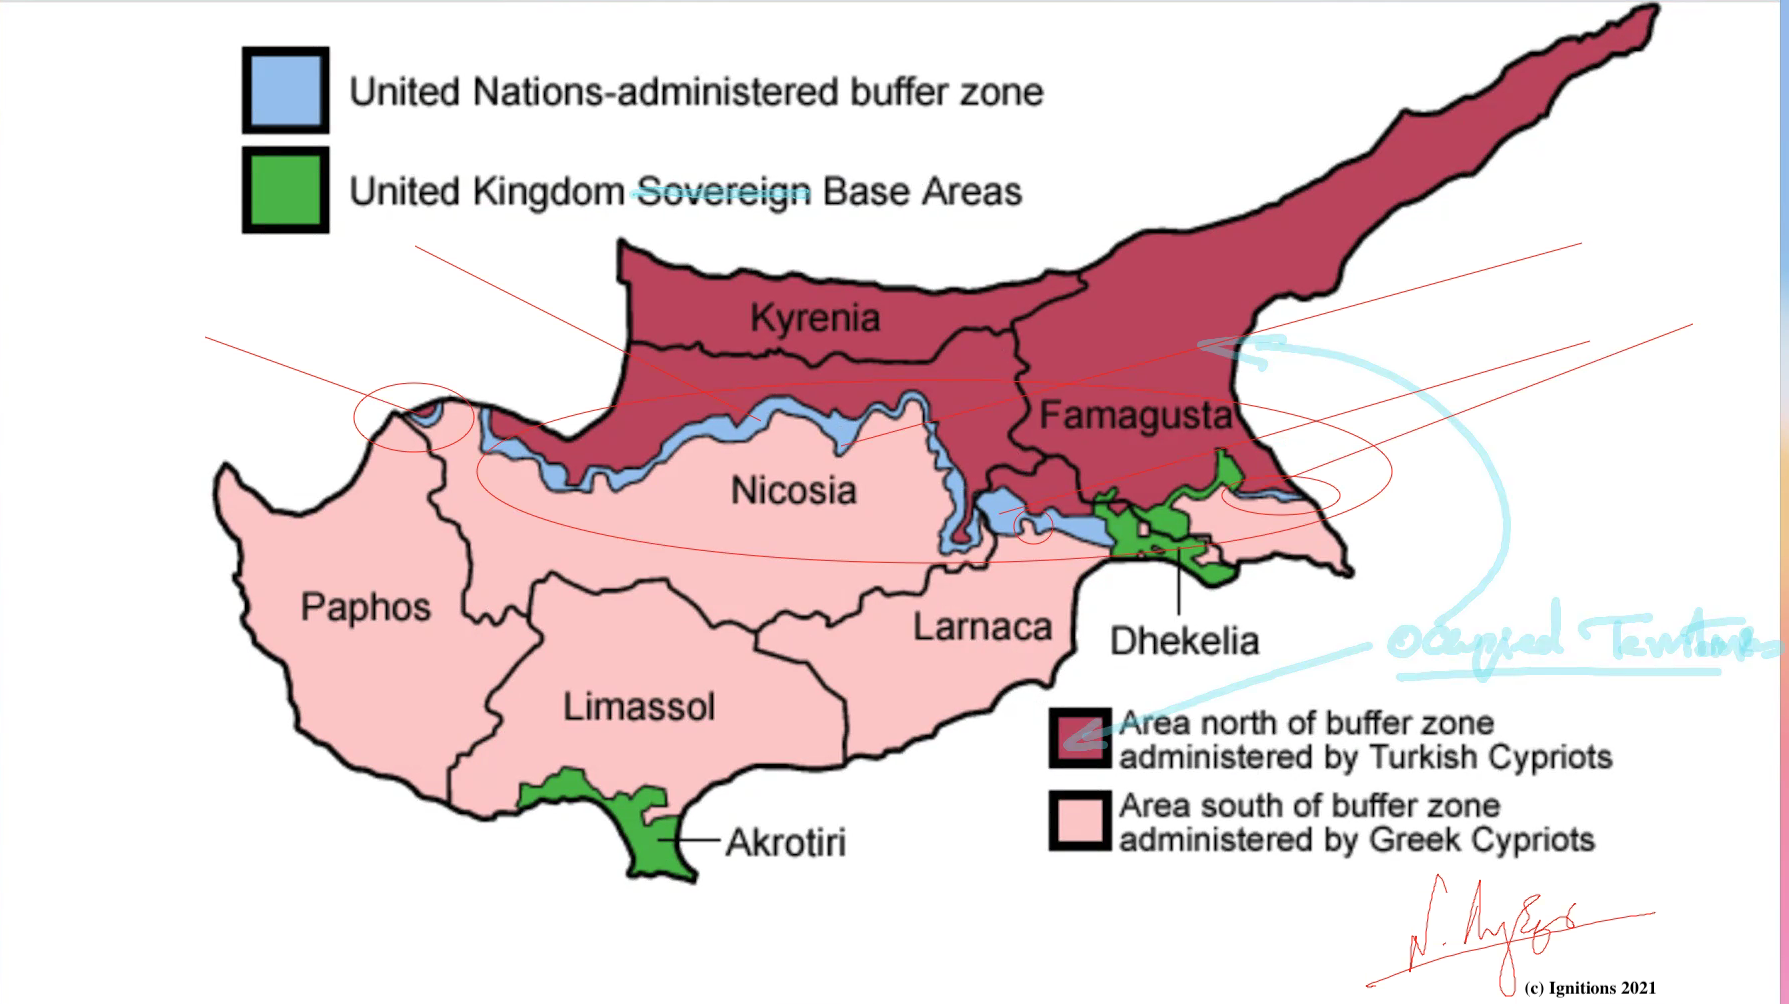 61937 - e-Μάθημα Ι: Τοποστρατηγική ανάλυση κυπριακού. (Dessin)